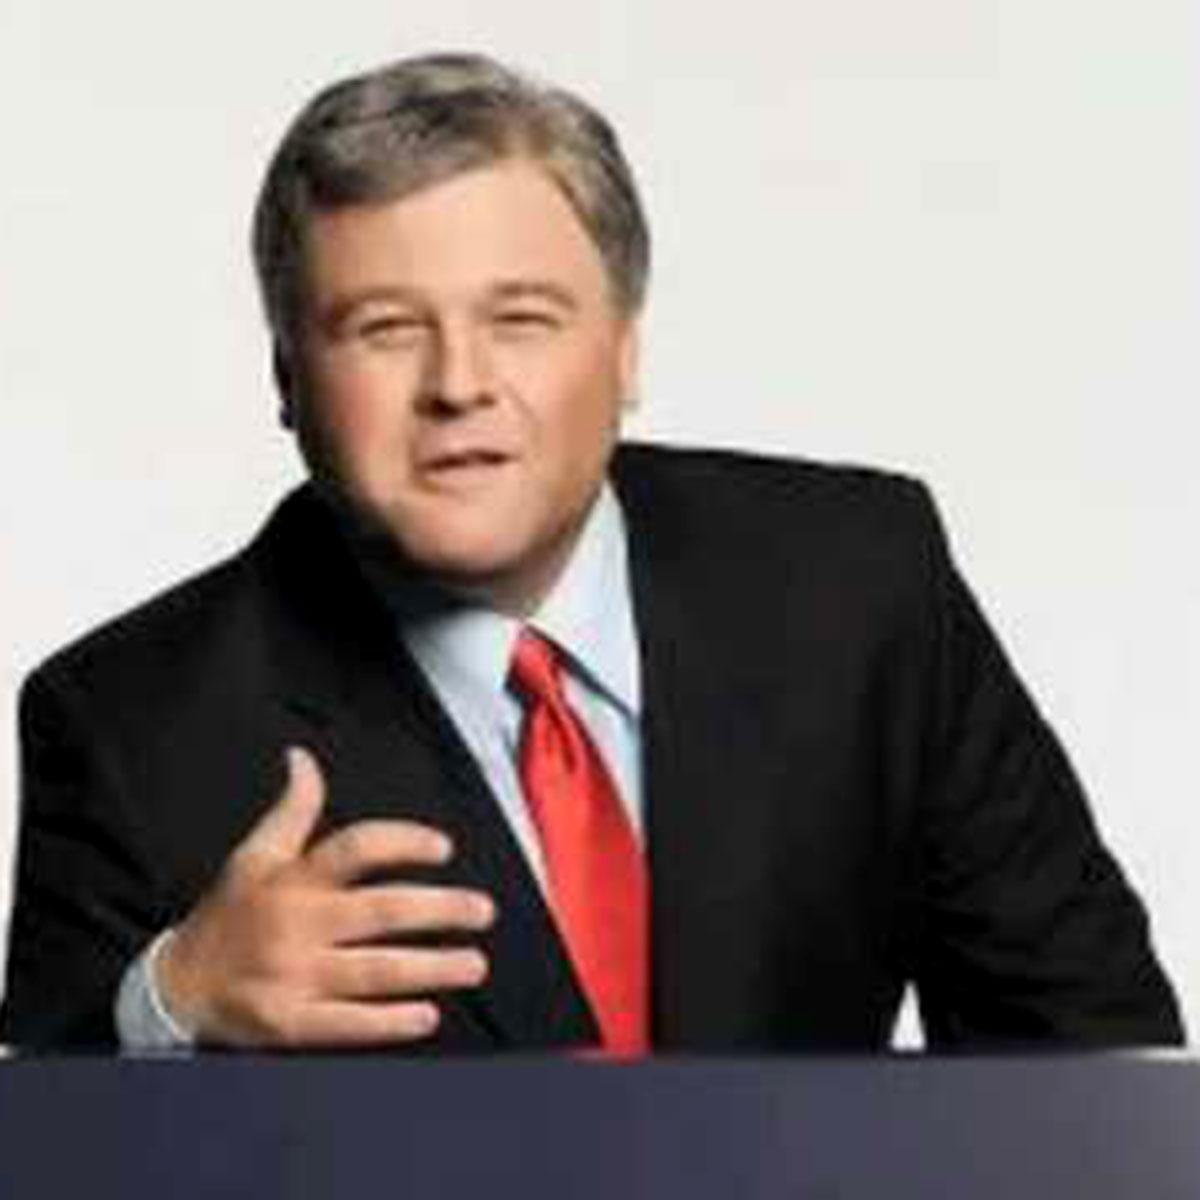 Frank Caliendo, George W. Bush